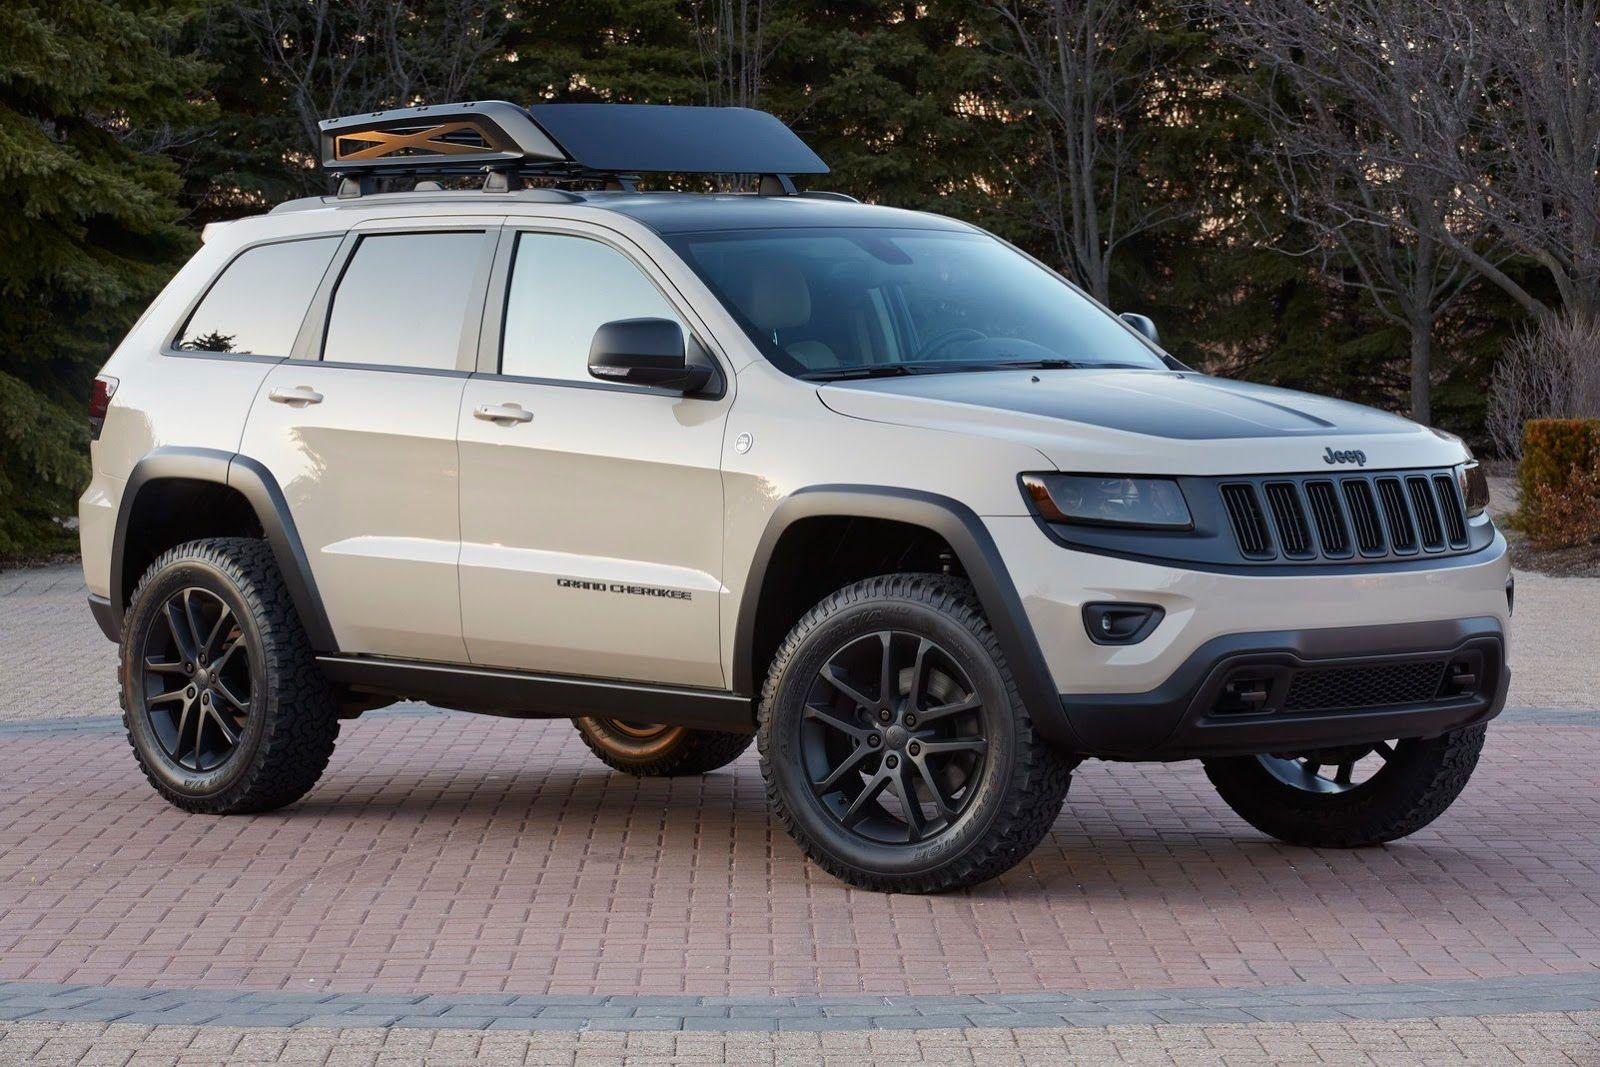 Easter Jeep Safari Modified Jeep Cherokee And Grand Cherokee 2014 Jeep Grand Cherokee Jeep Concept Jeep Grand Cherokee